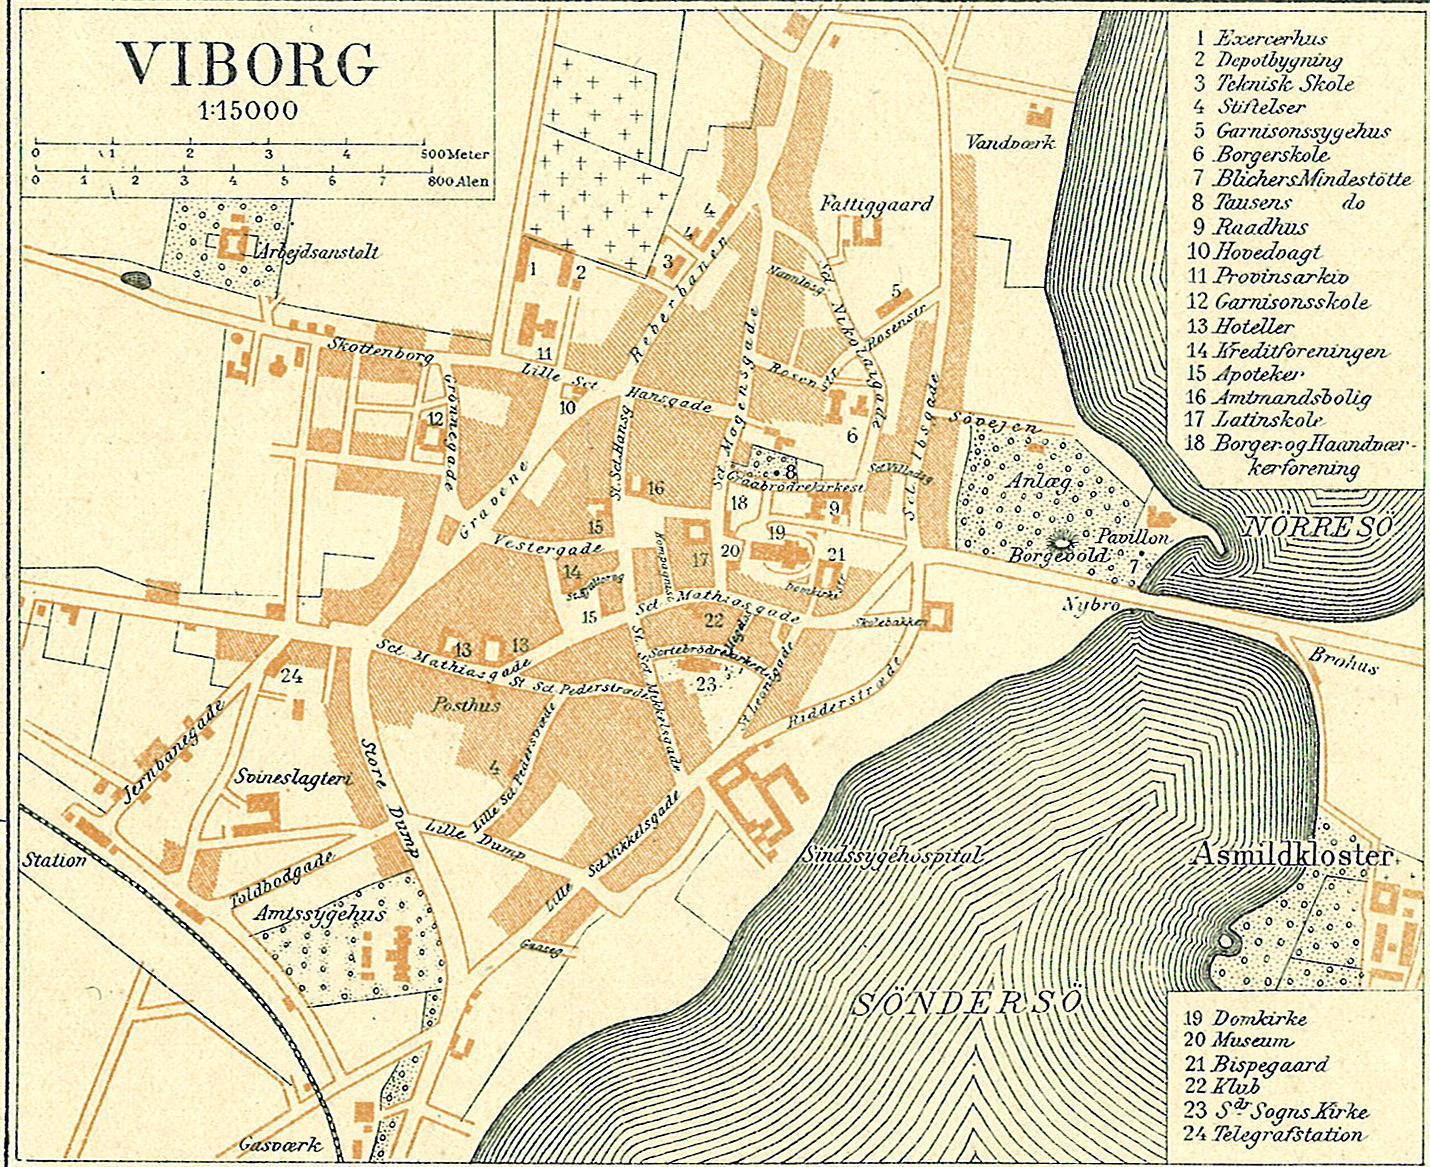 Dating Sider Dk Viborg